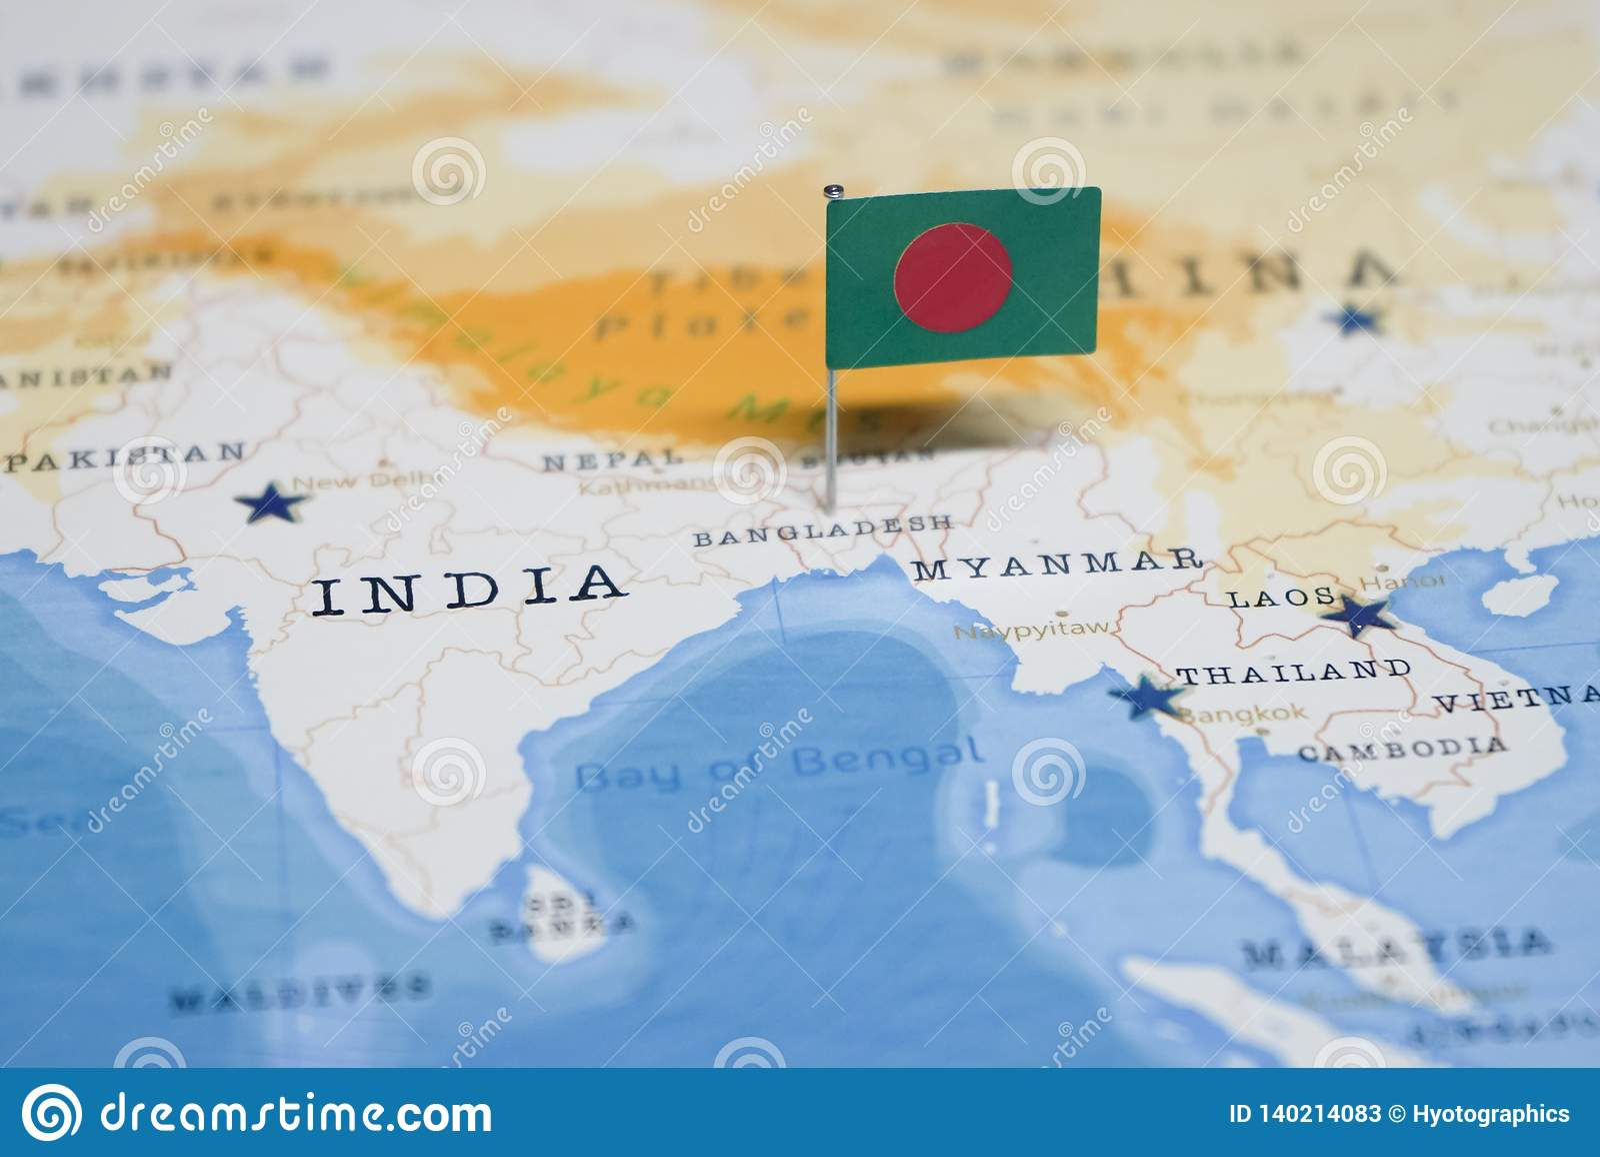 244 Bangladesh Map Photos Free Royalty Free Stock Photos From Dreamstime